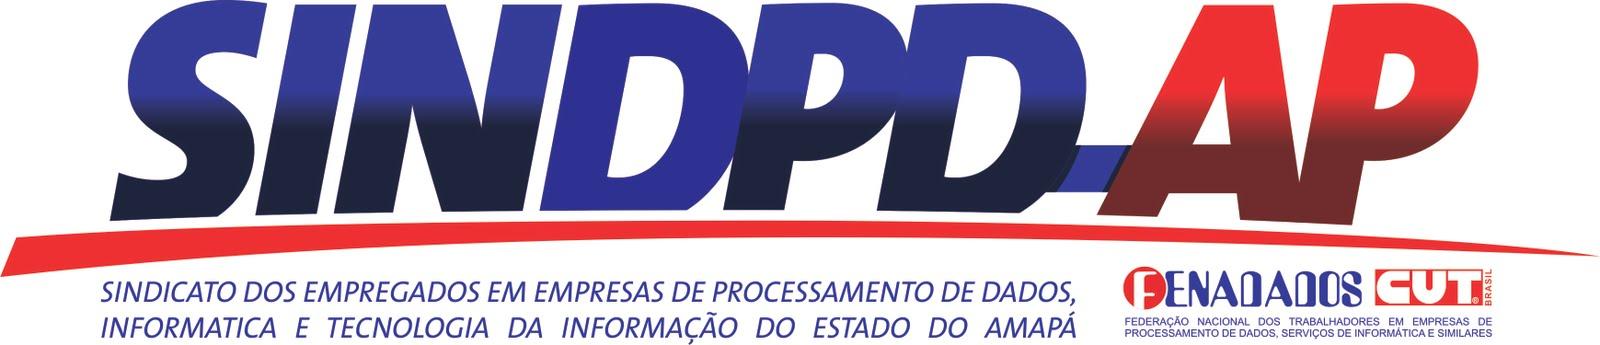 SINDPD-AP